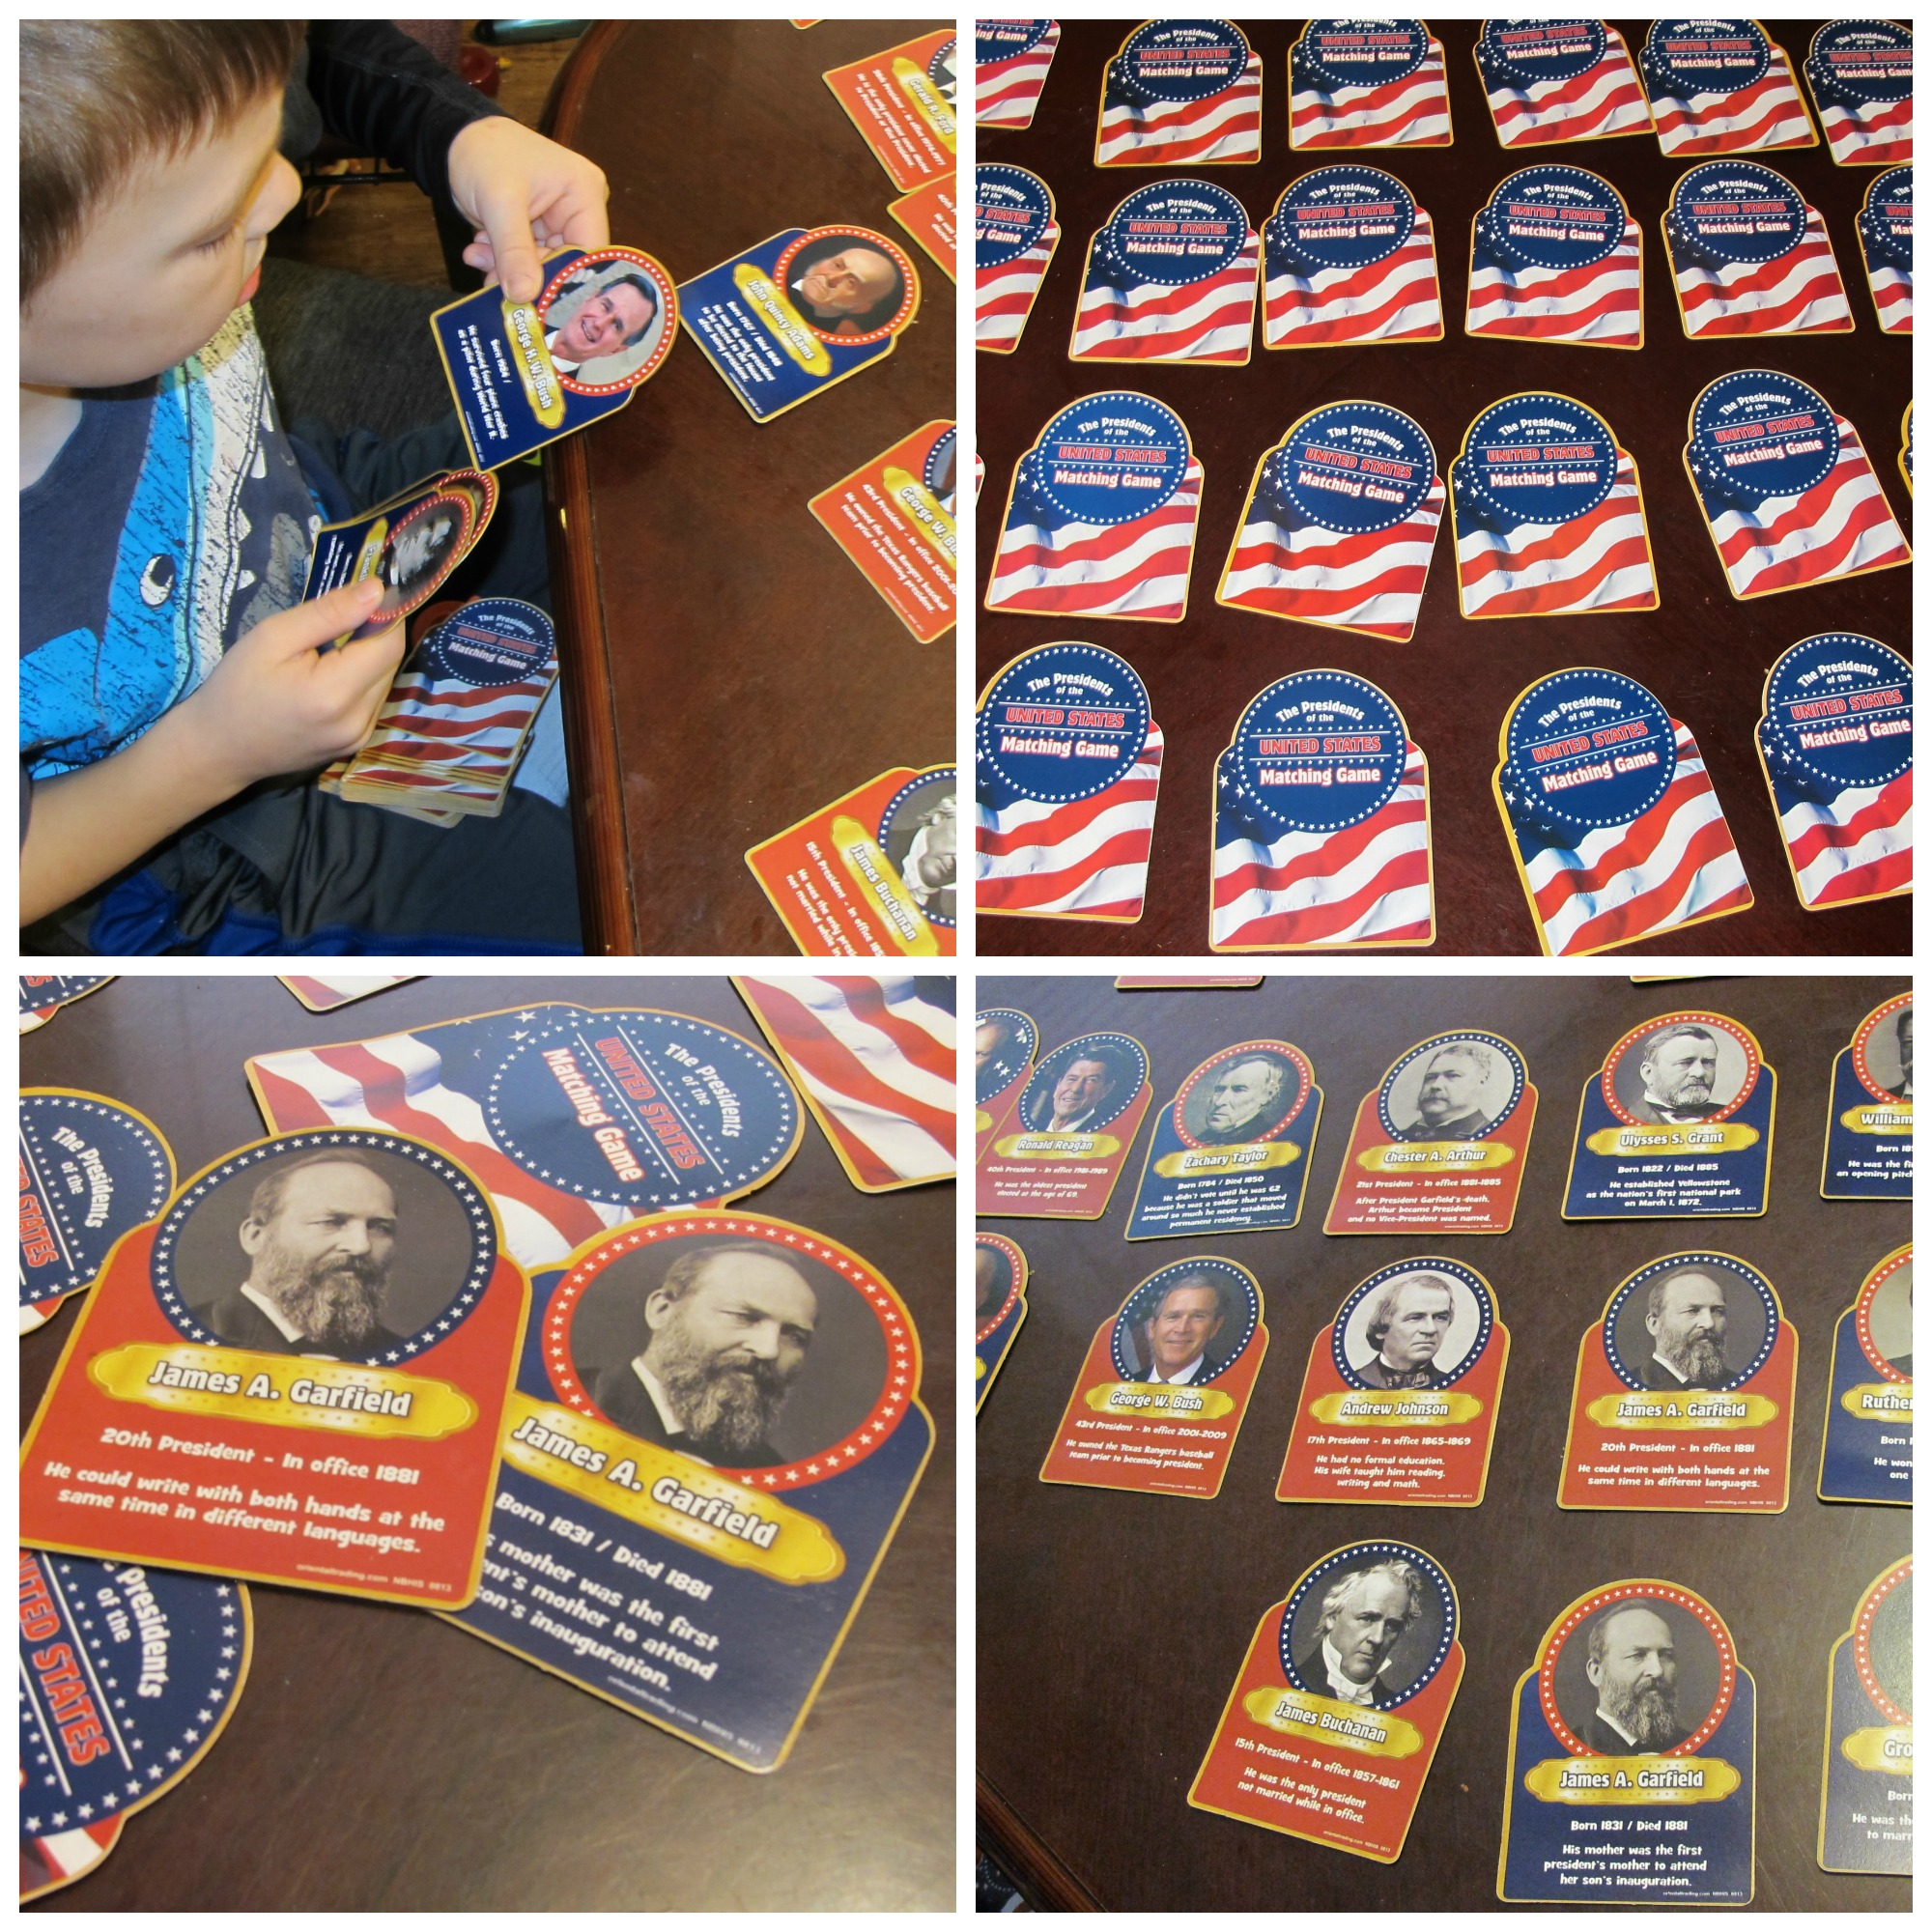 presidentialmatchinggame2